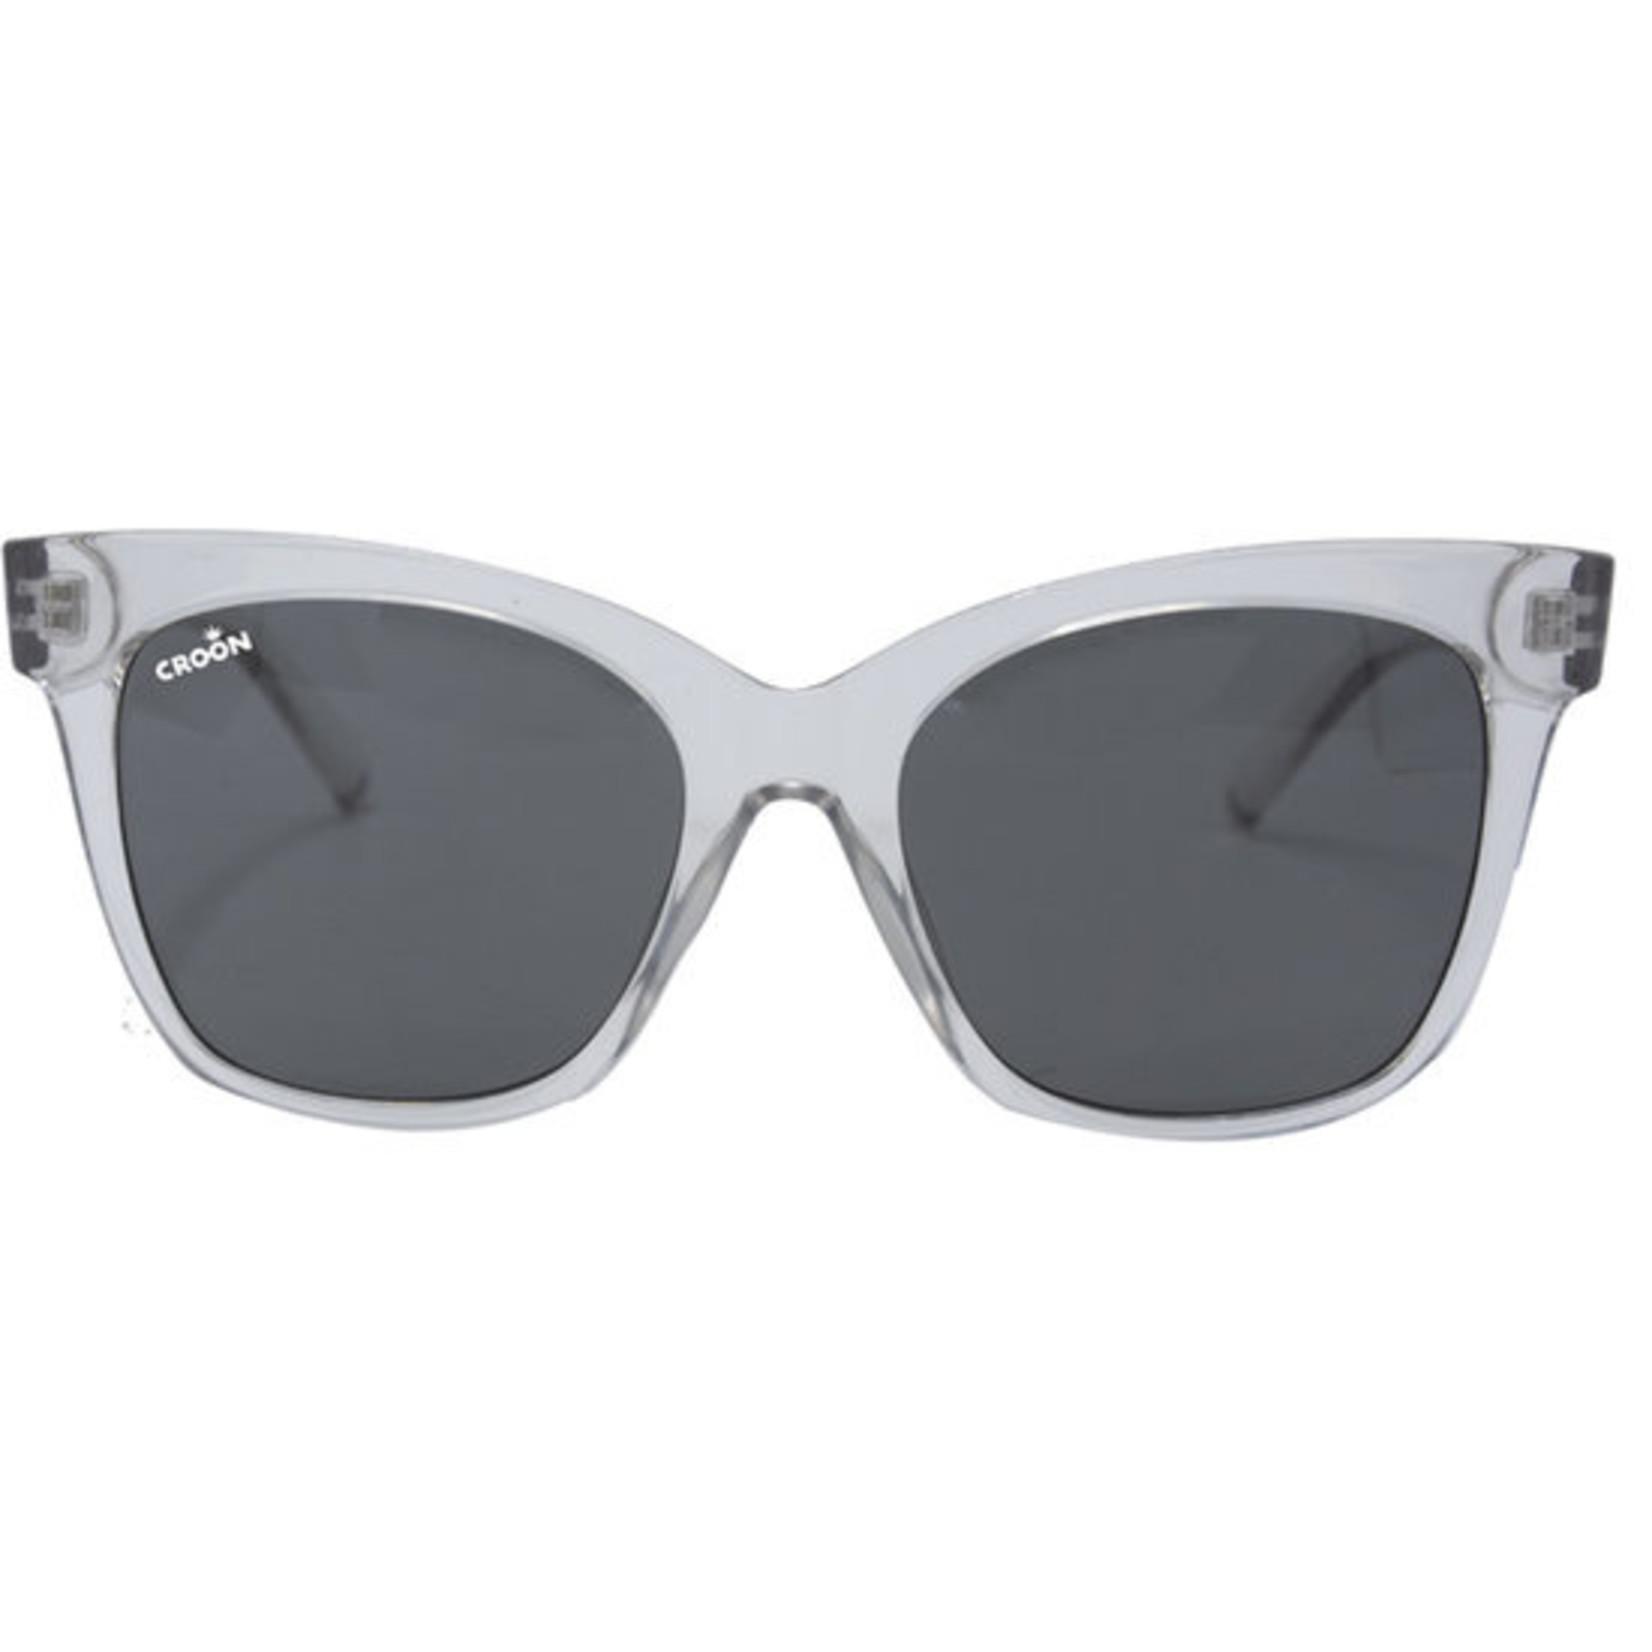 Croon Jacky Transparant zonnebril